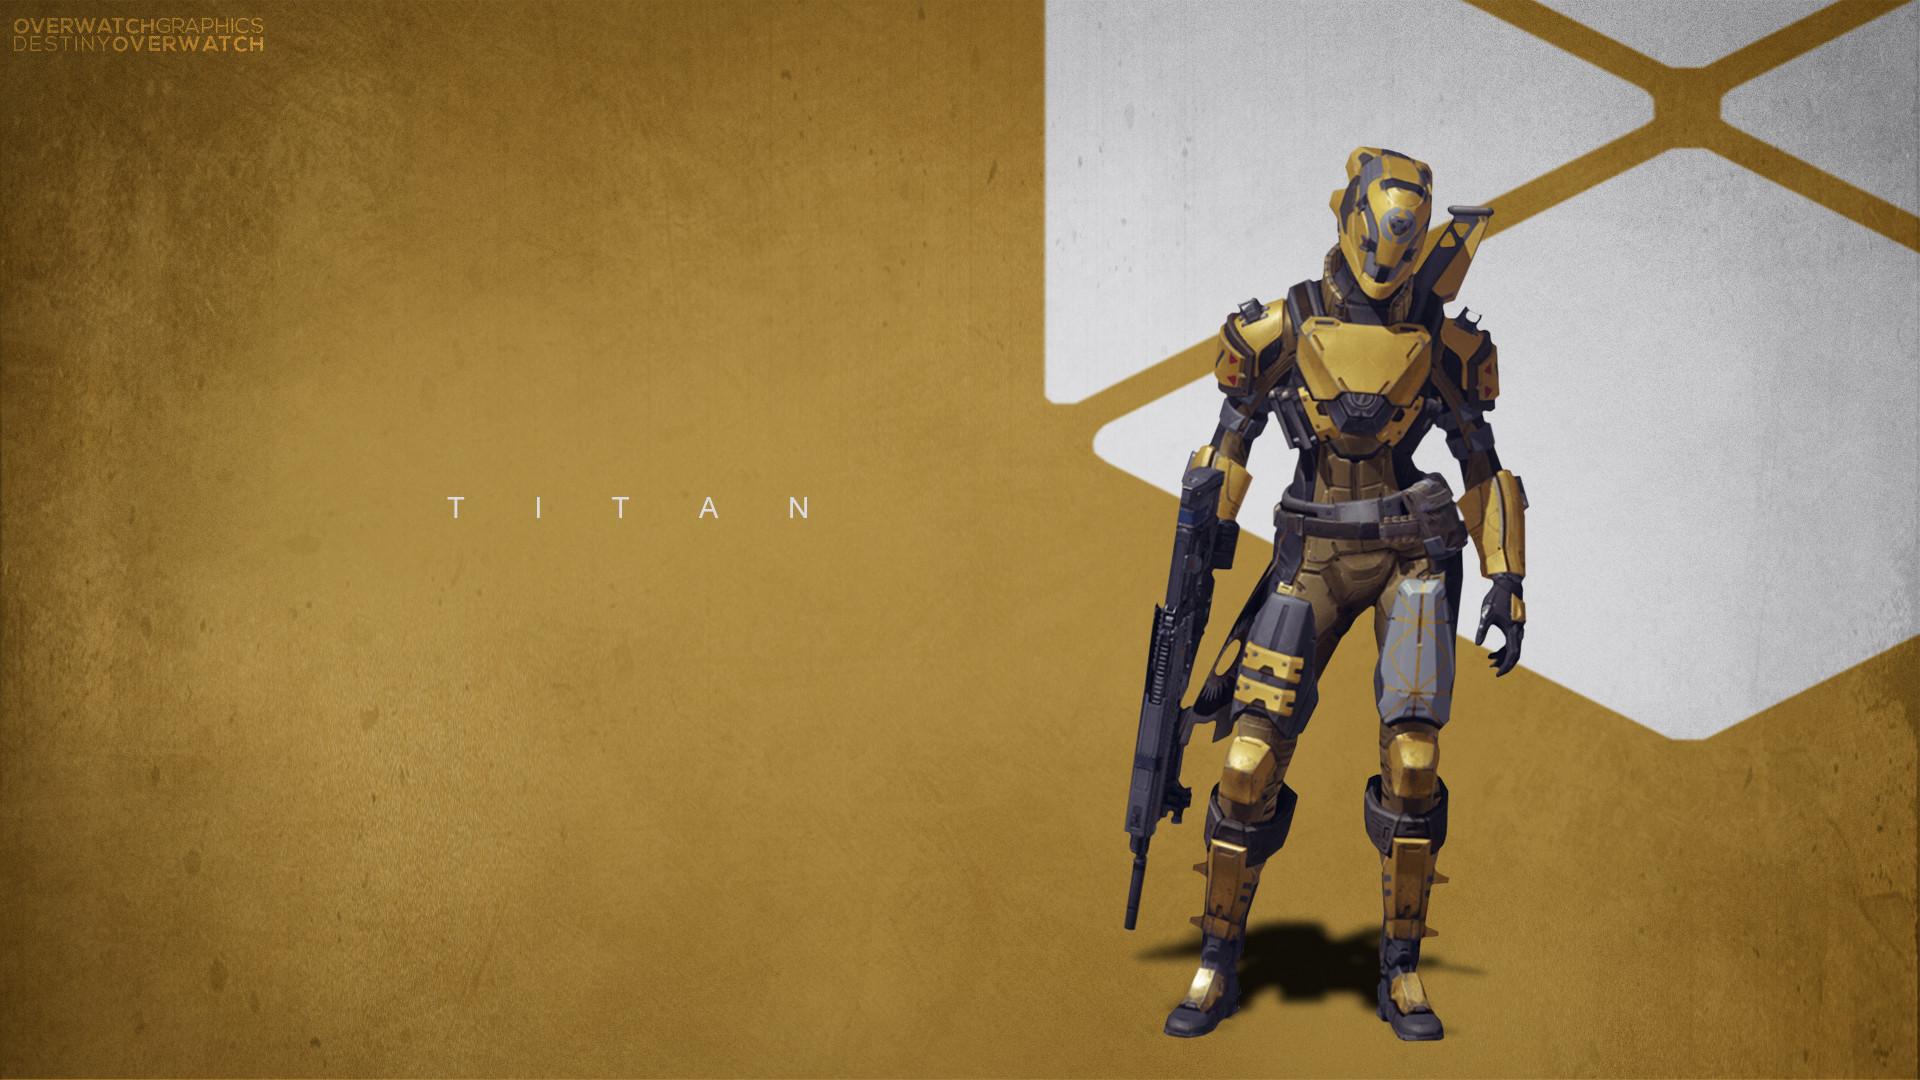 Destiny – Titan Wallpaper by OverwatchGraphics Destiny – Titan Wallpaper by  OverwatchGraphics